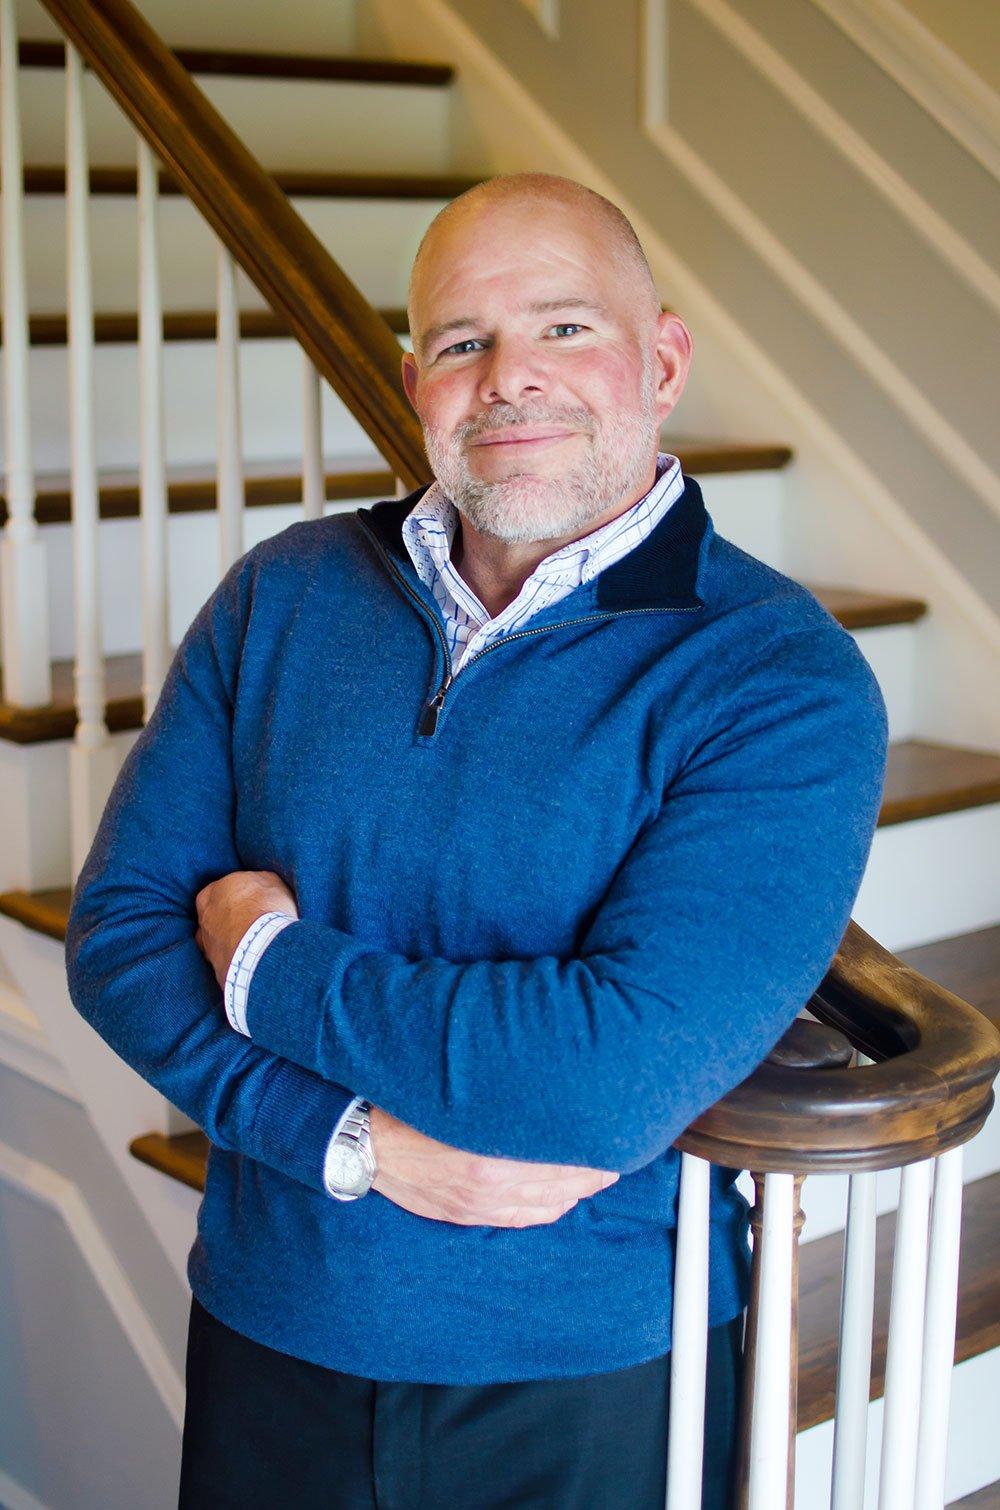 image of Jason Outten